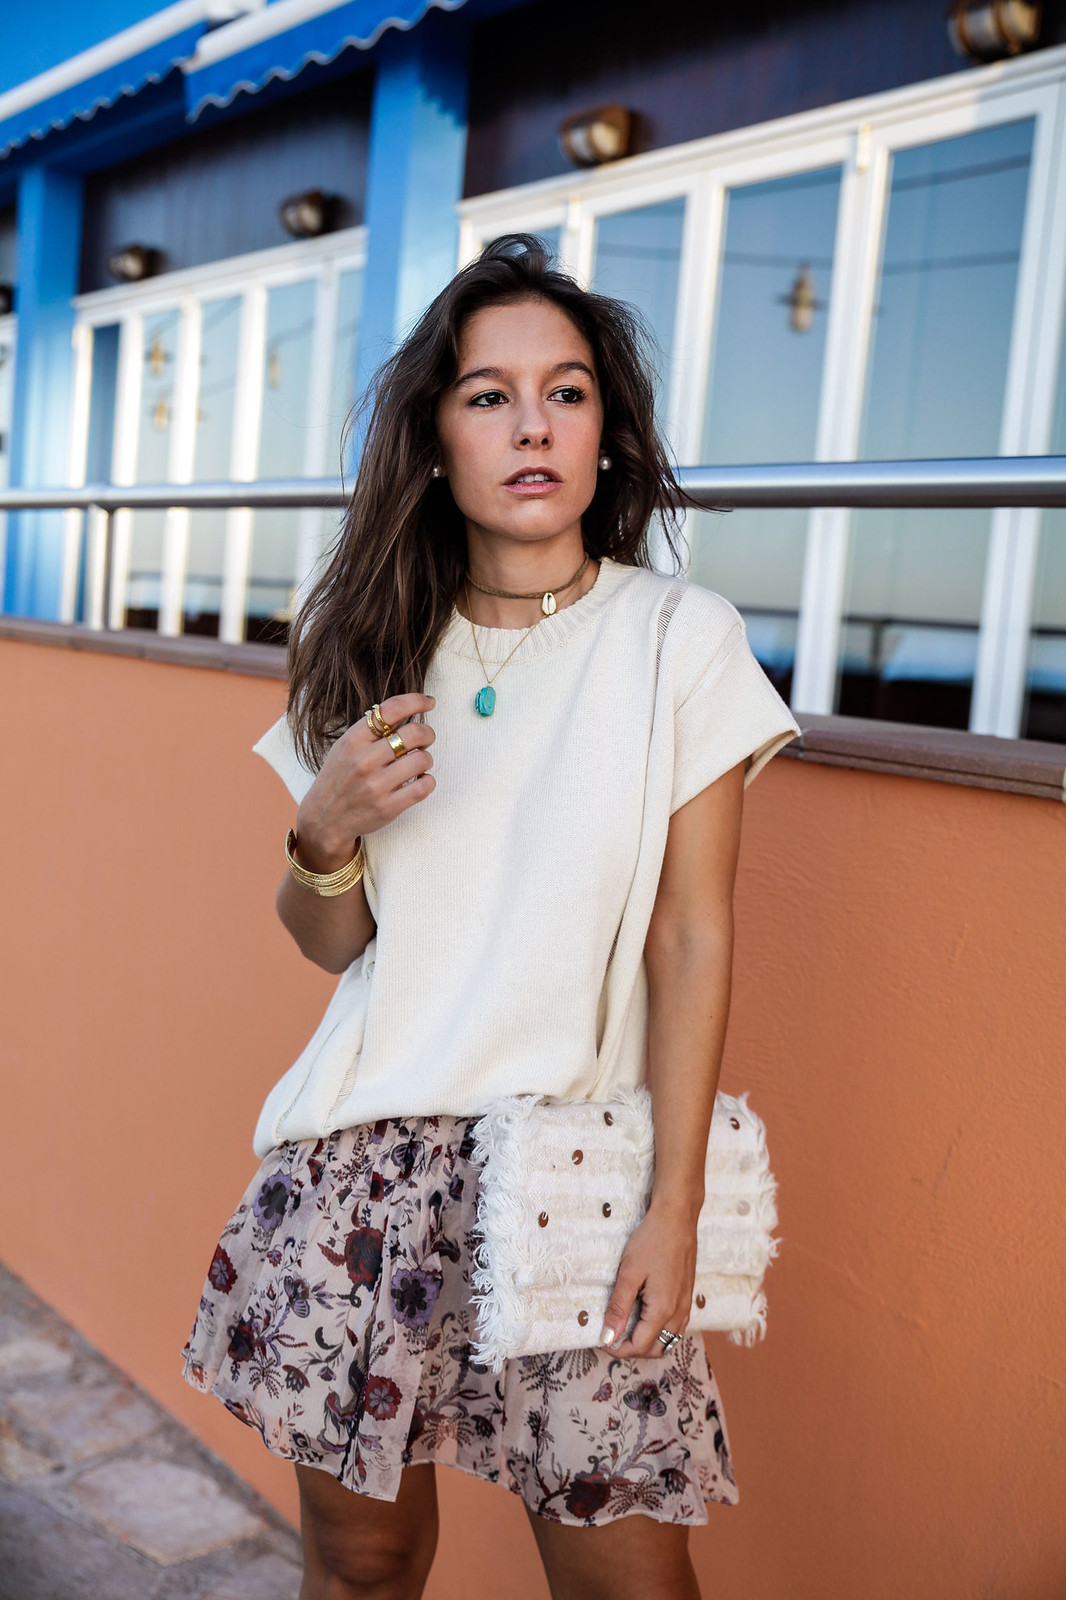 010_blusa_punto_falda_flores_summer_outfit_theguestgirl_rüga_schade_jewels_steve_madden_.magali_pasacal_influencer_barcelona_blogger